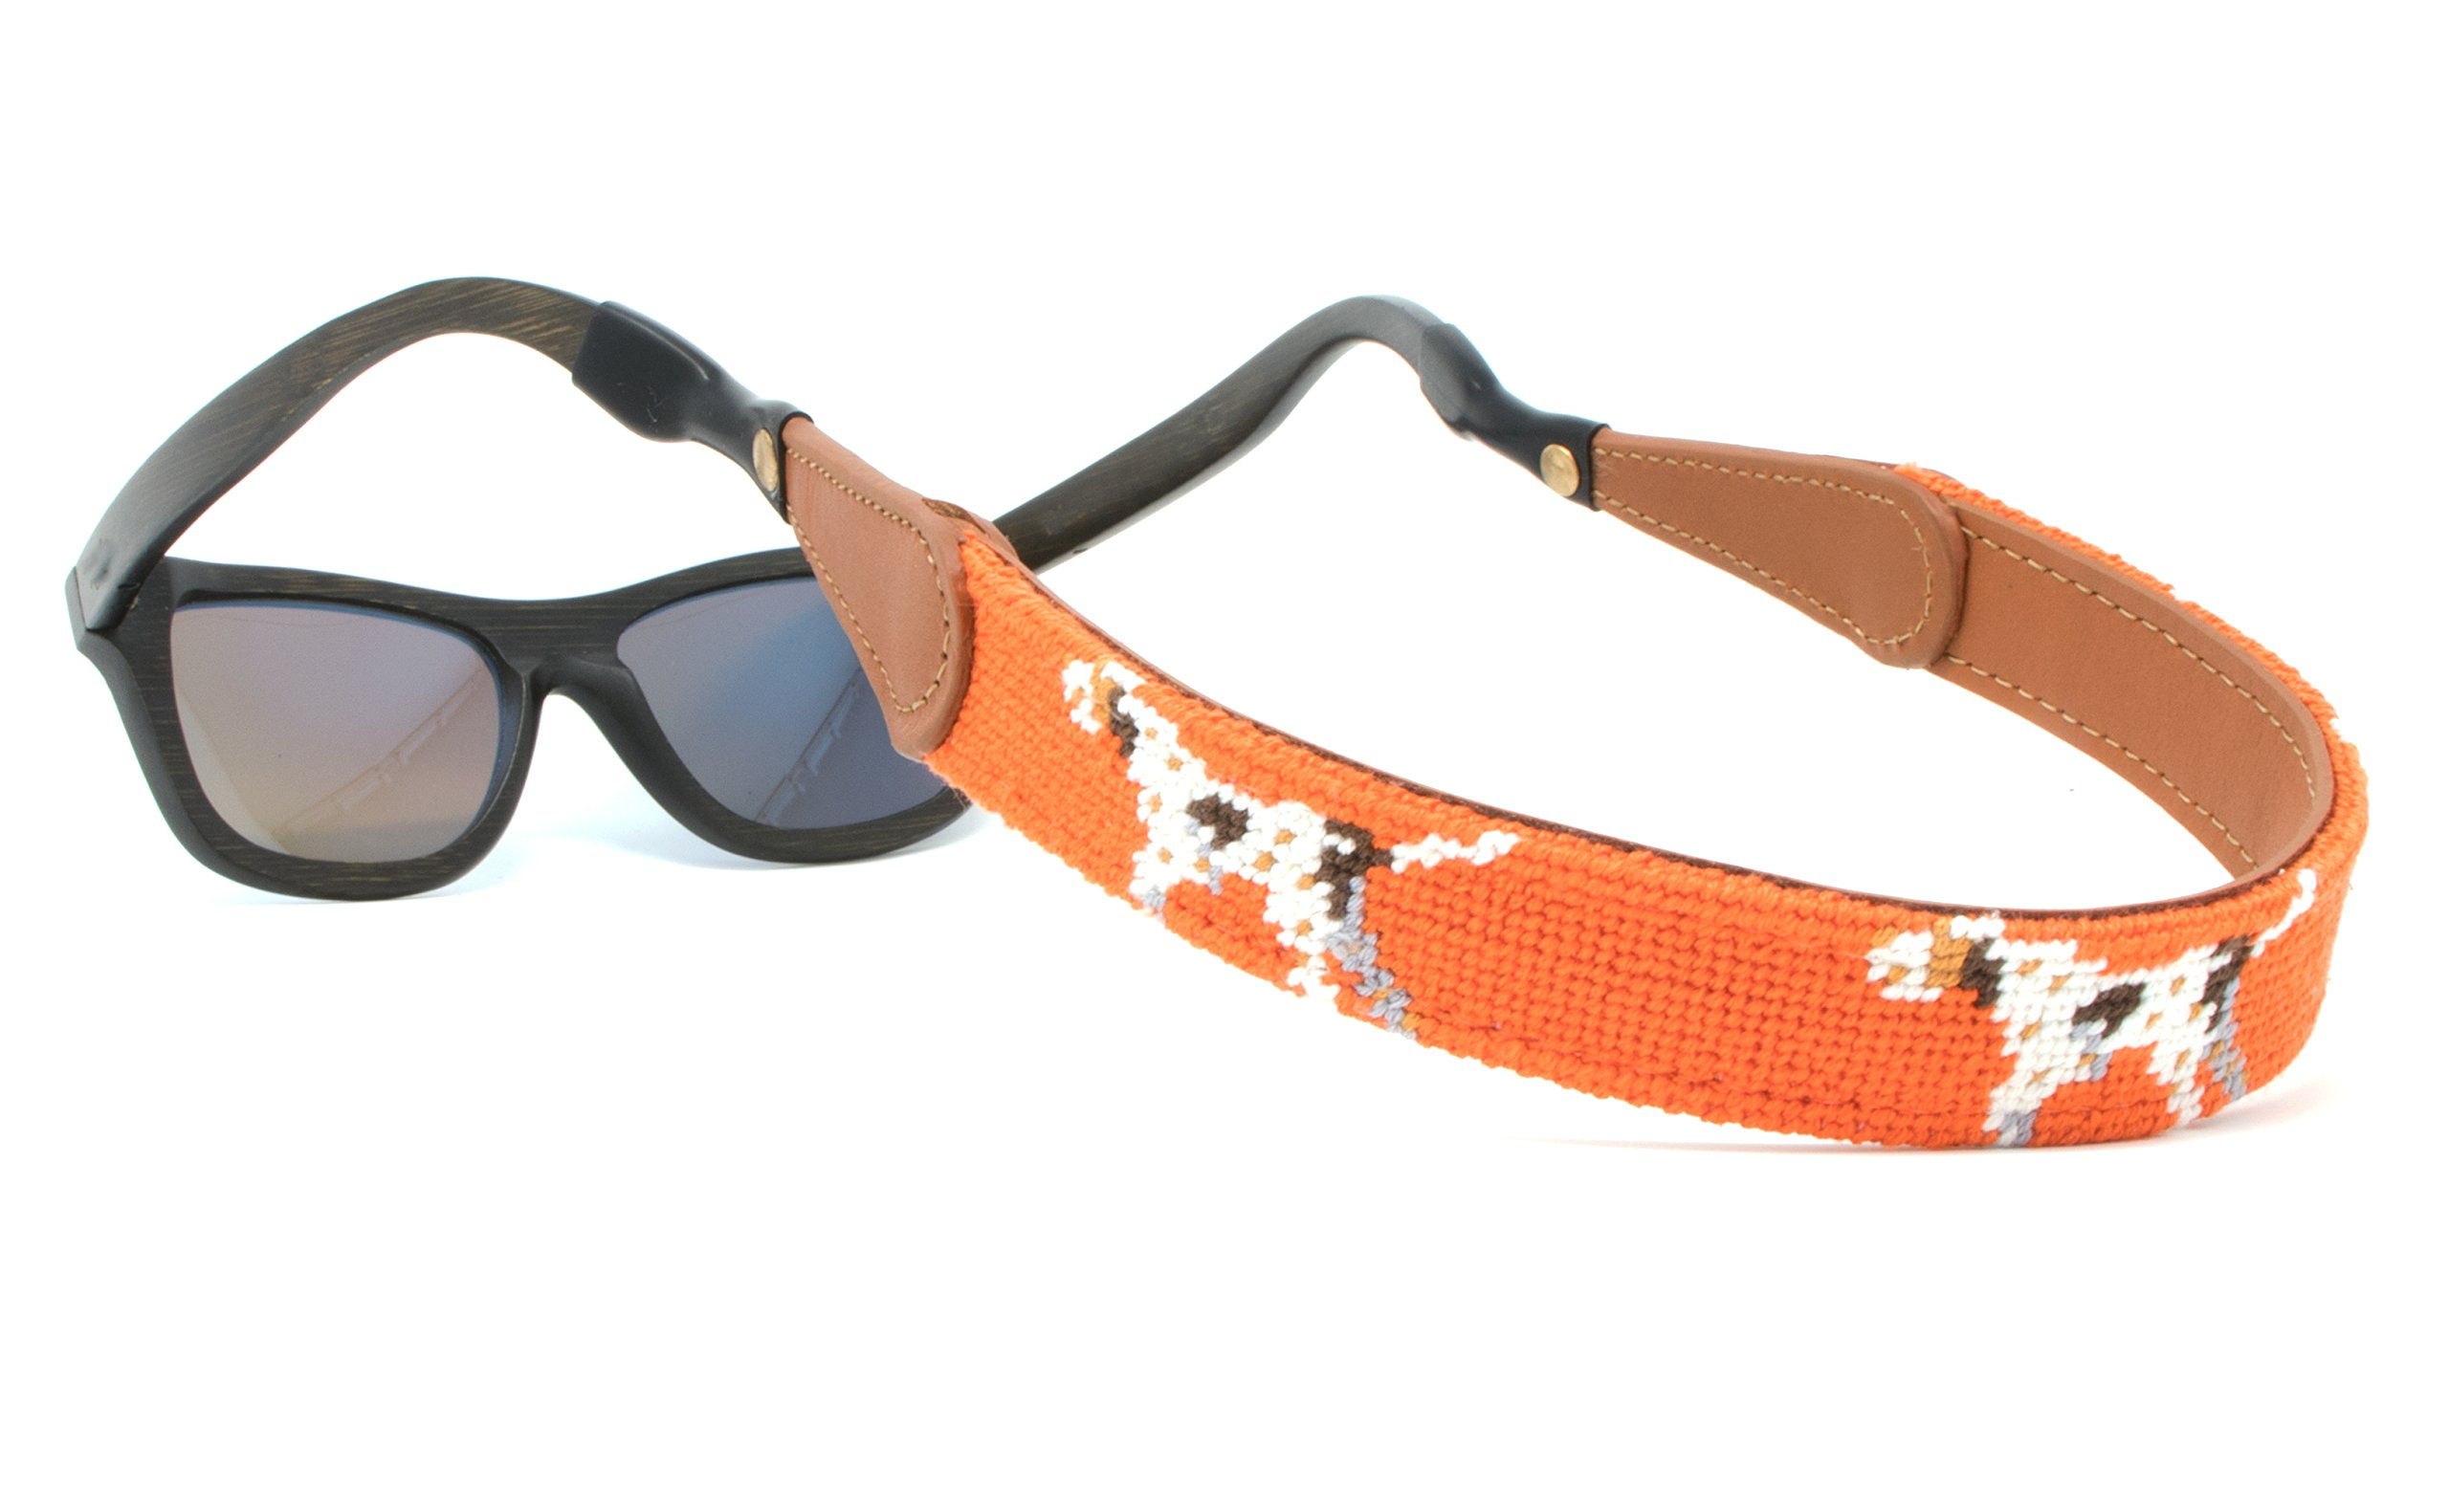 Needlepoint Sunglass Strap Sunglass Retainer by Huck Venture (Pointer Dog)